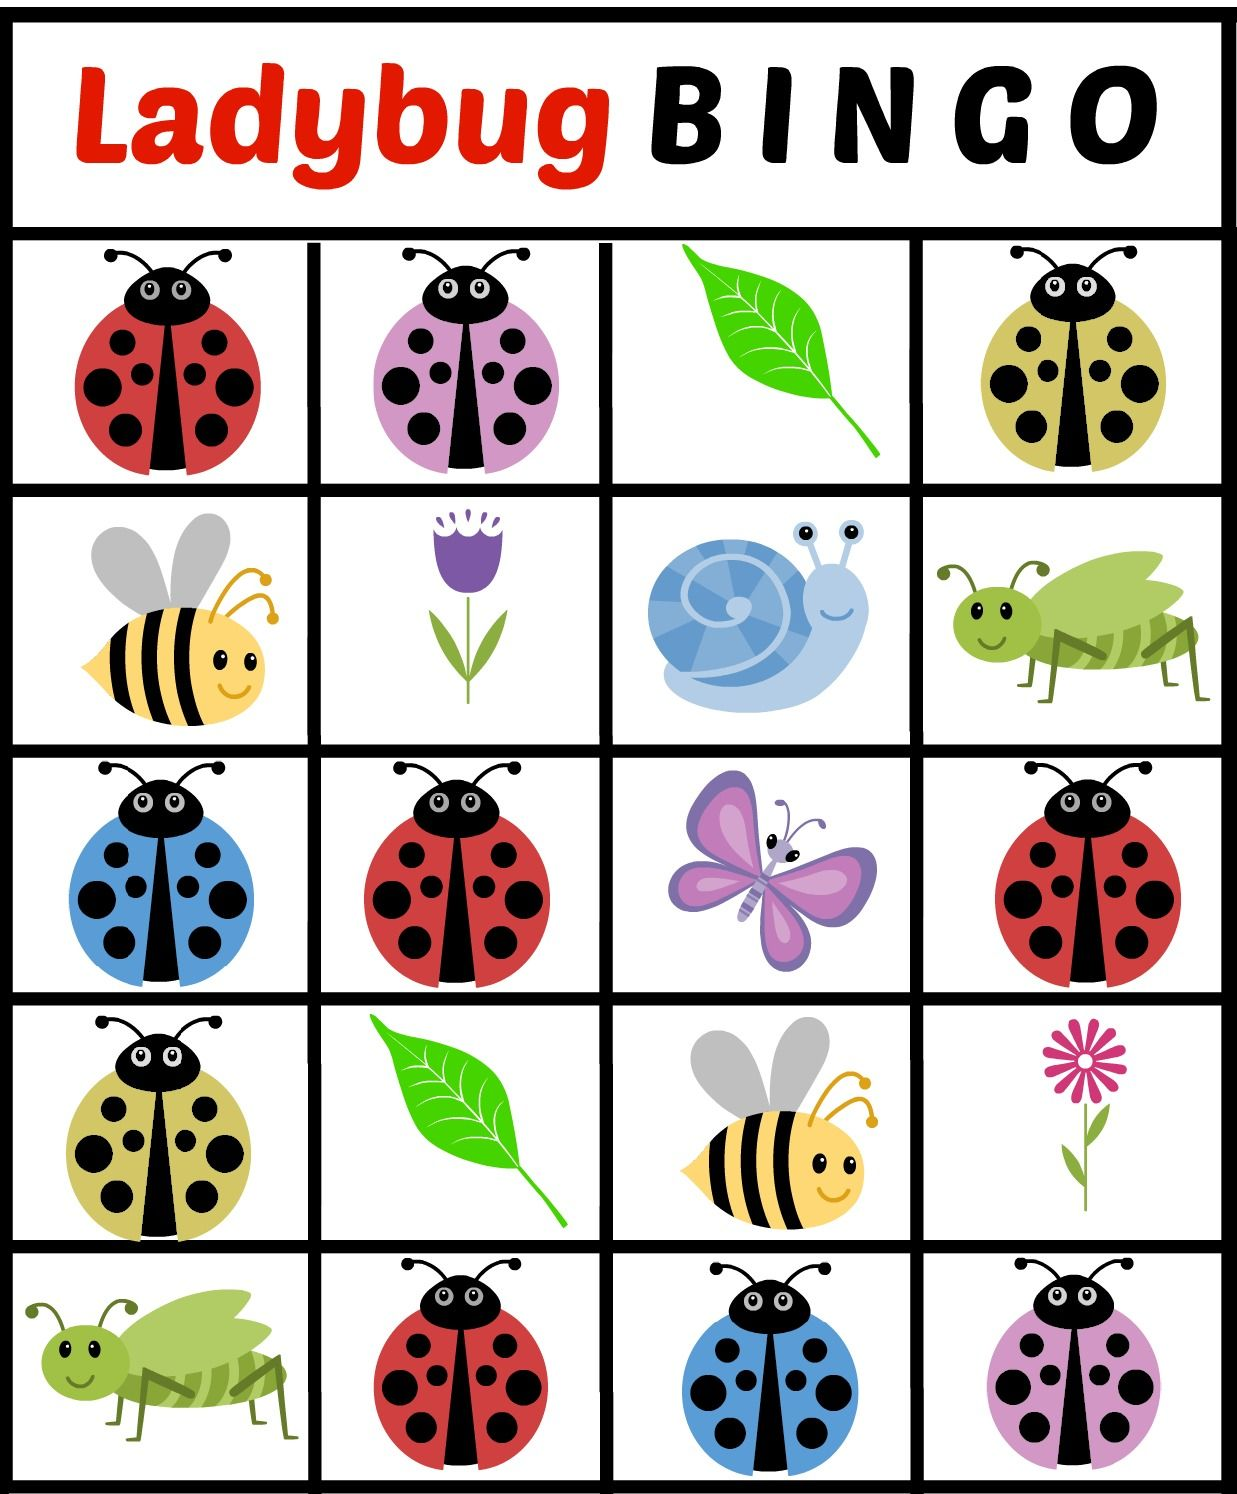 Free Printable Lady Bug Themed BINGO Game Cards